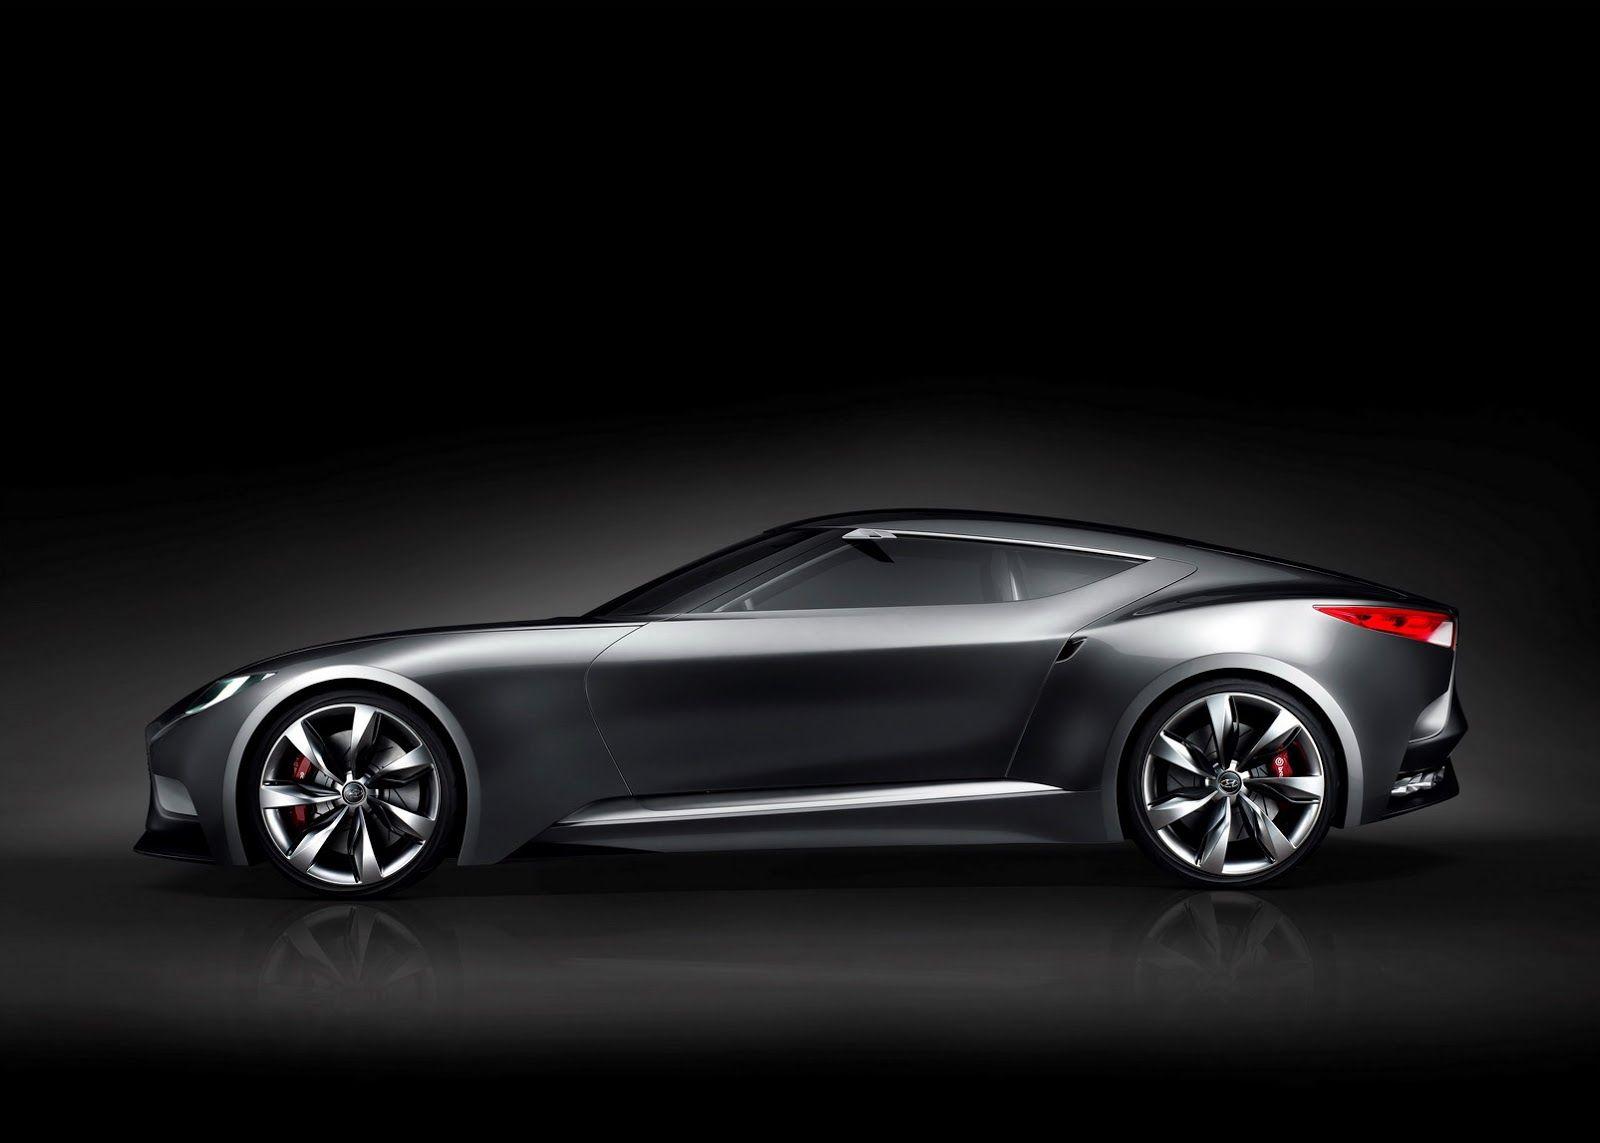 Genesis Said To Be Developing Bmw M4 Rivalling Coupe Carscoops In 2020 Hyundai Genesis Hyundai Genesis Coupe 2015 Hyundai Genesis Coupe